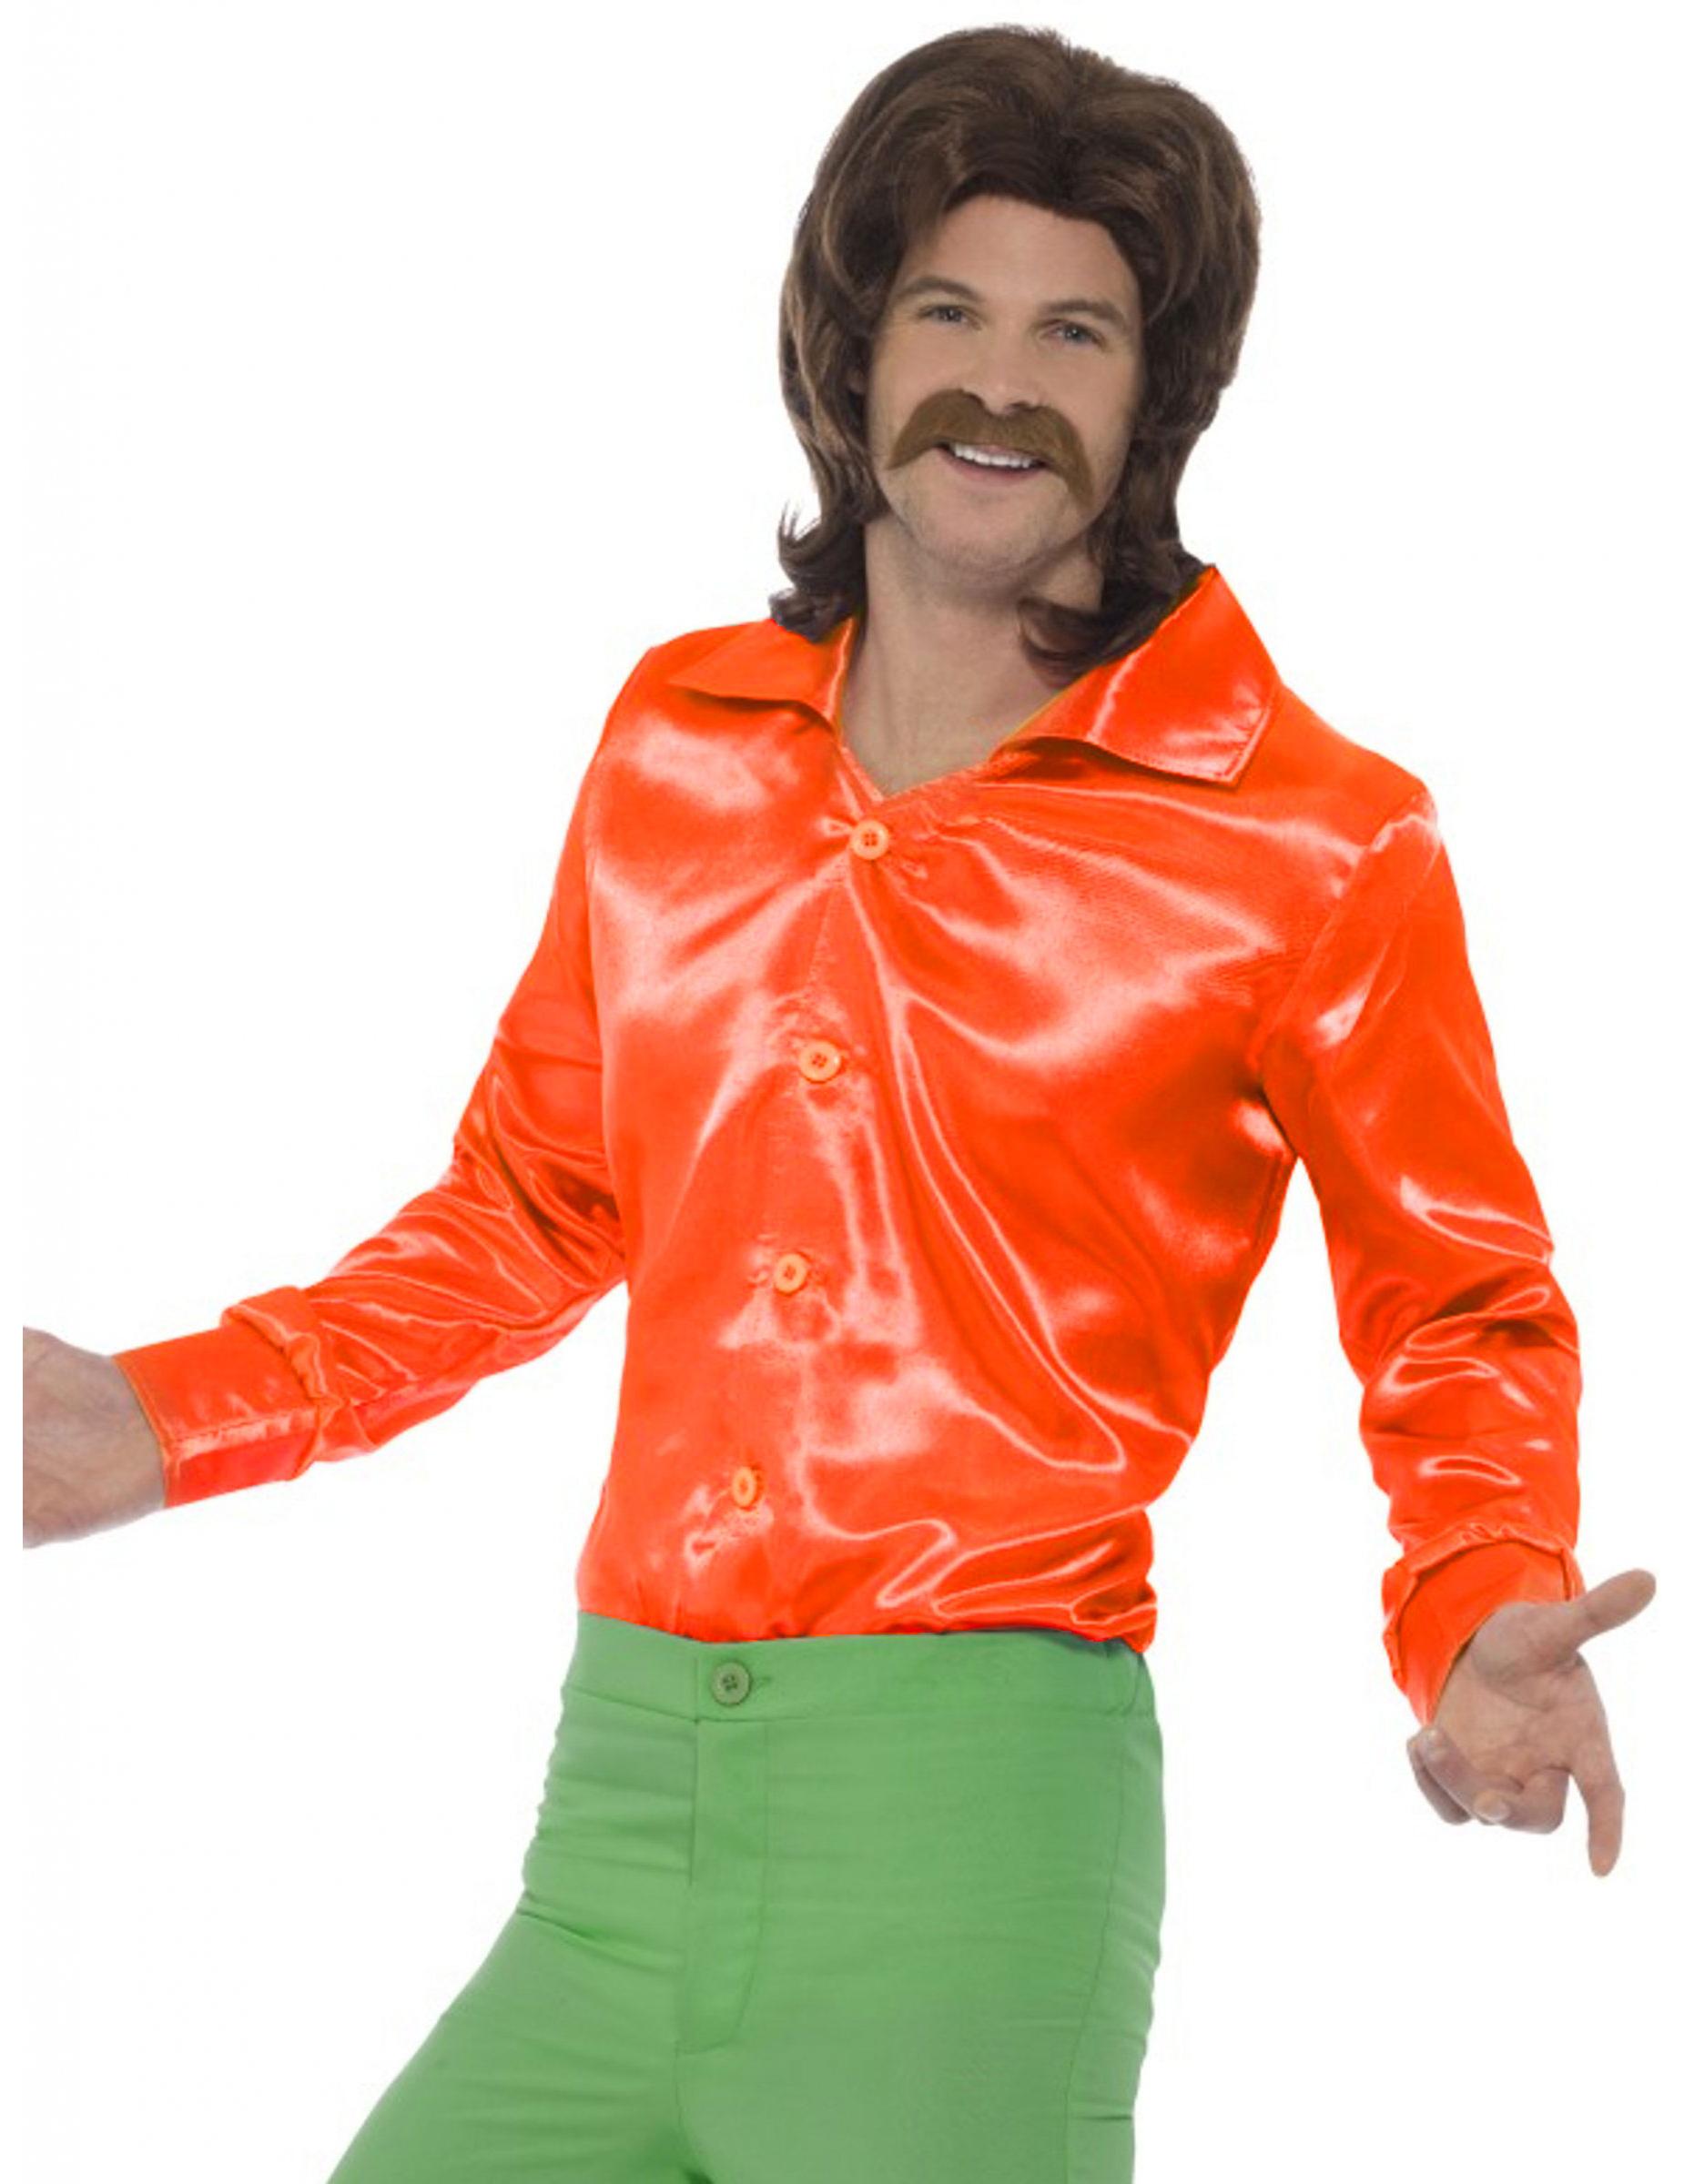 a6f447255aaf0 Camisa naranja satinada fluo hombre  Disfraces adultos